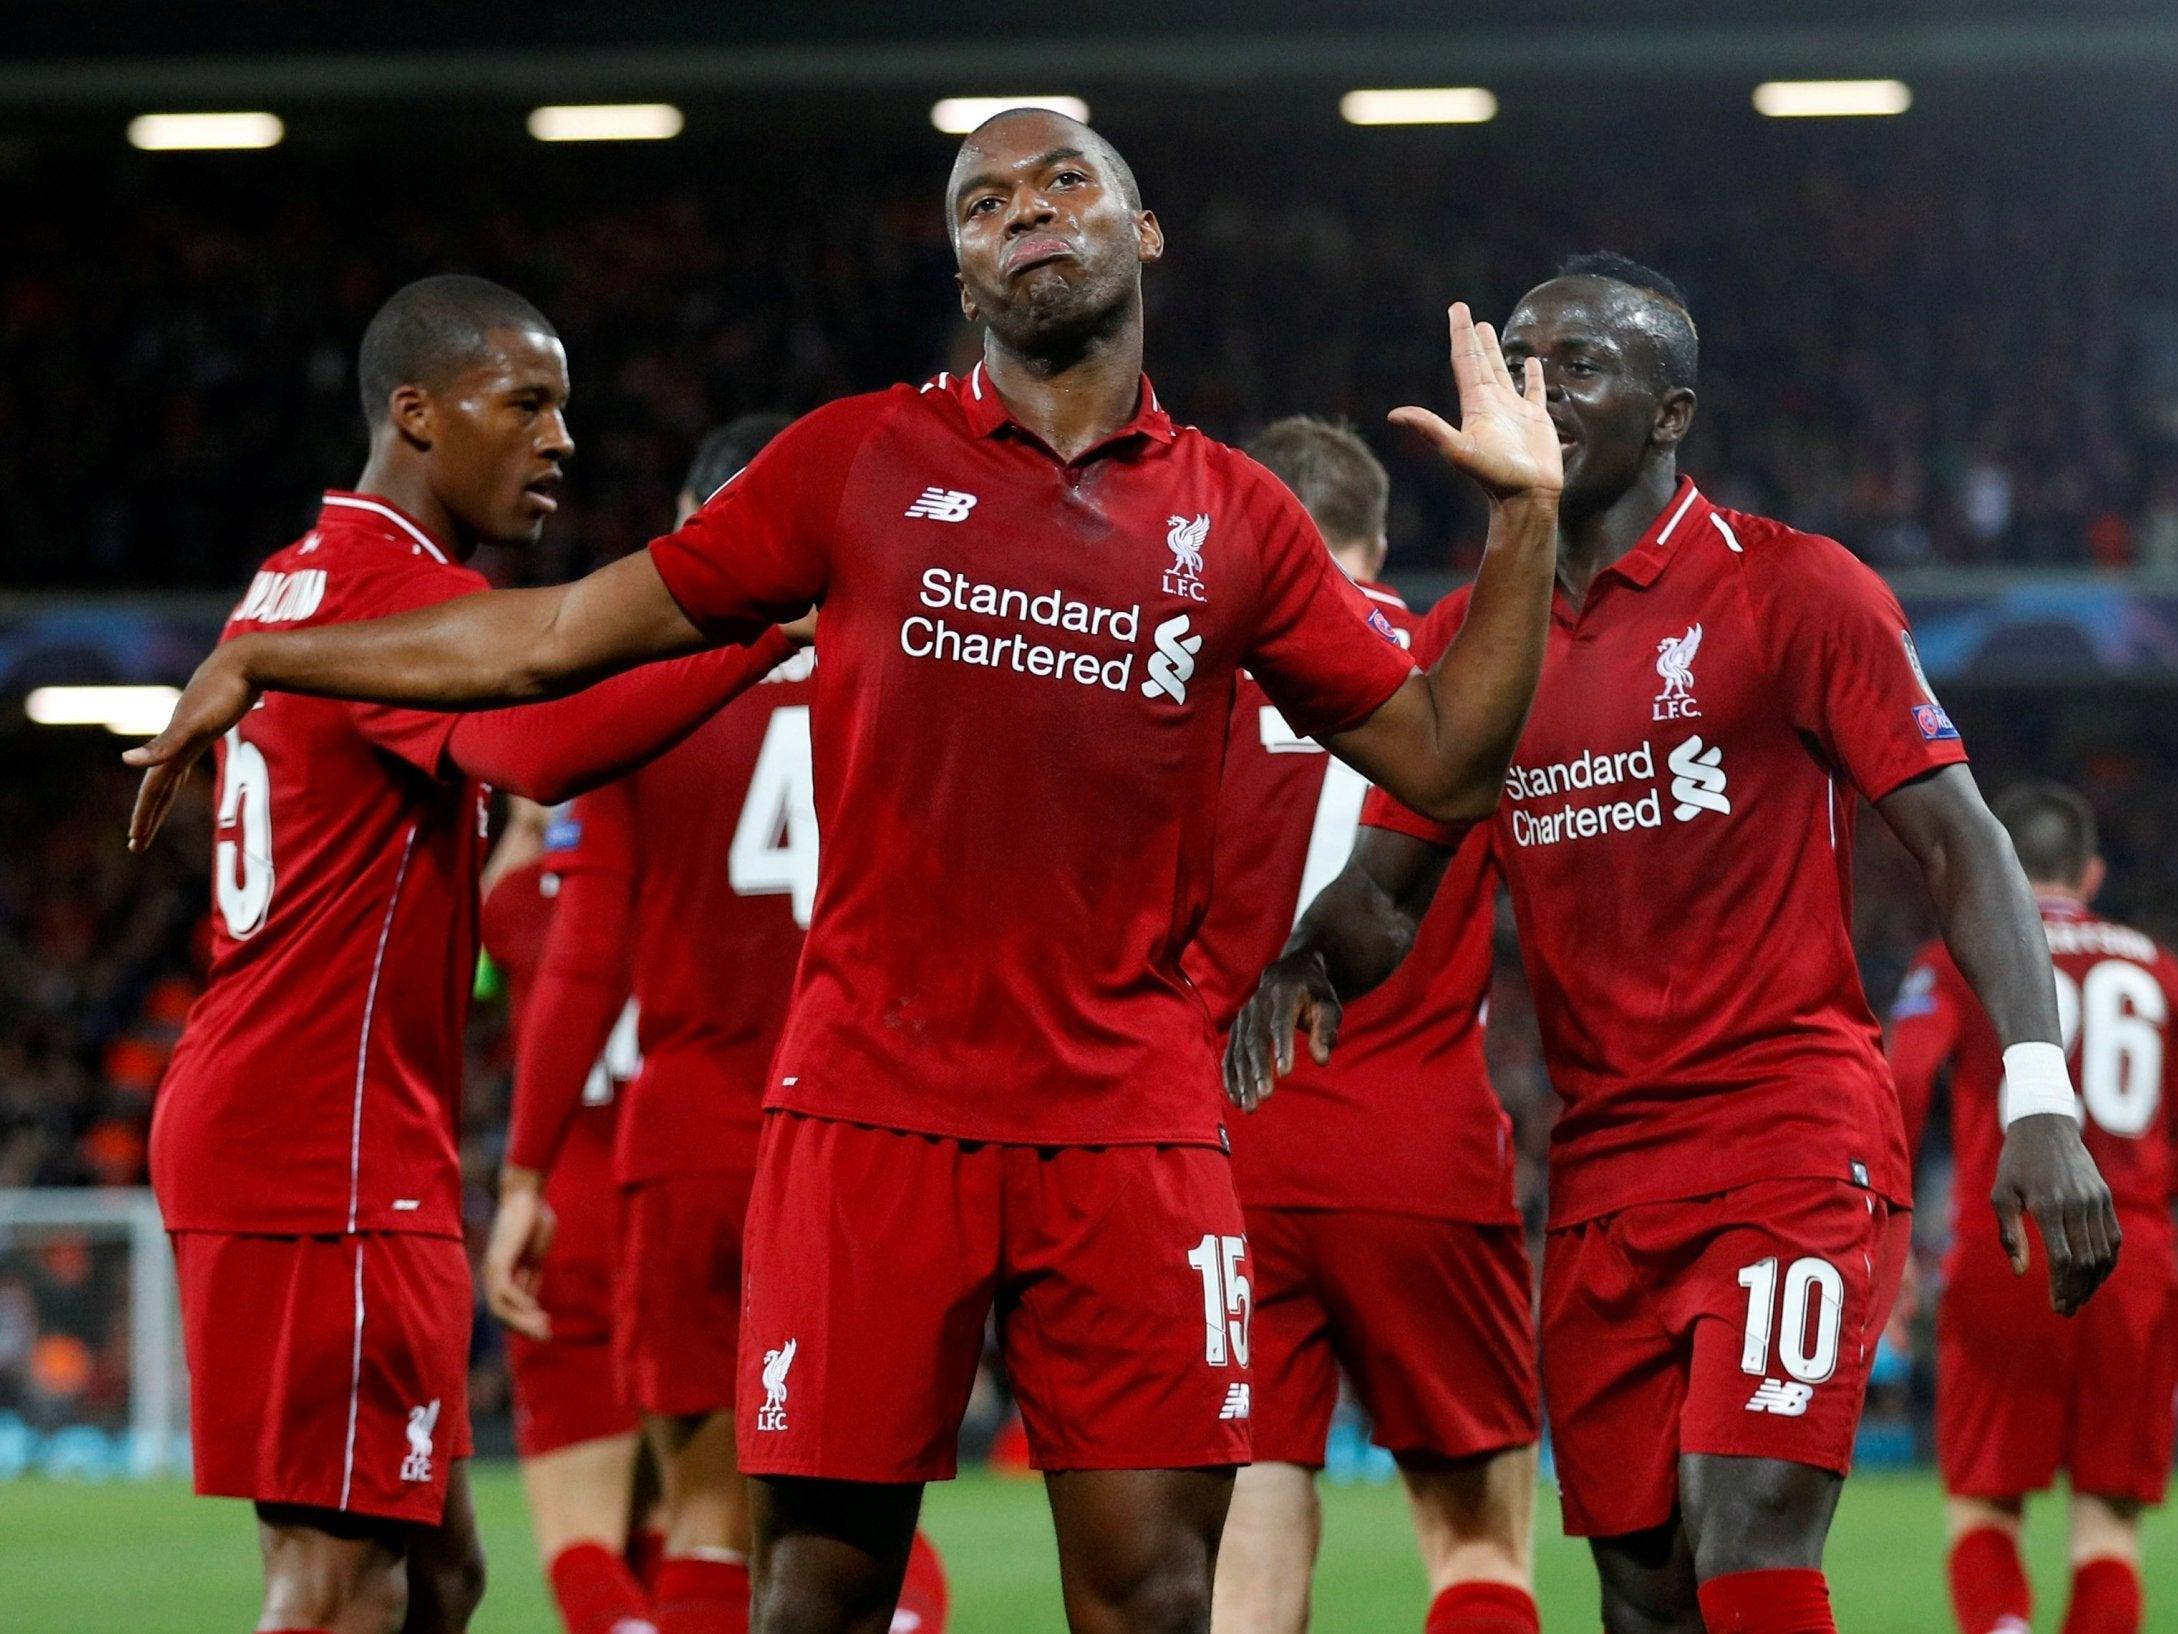 Sturridge: Daniel Sturridge Achieves Champions League Redemption With